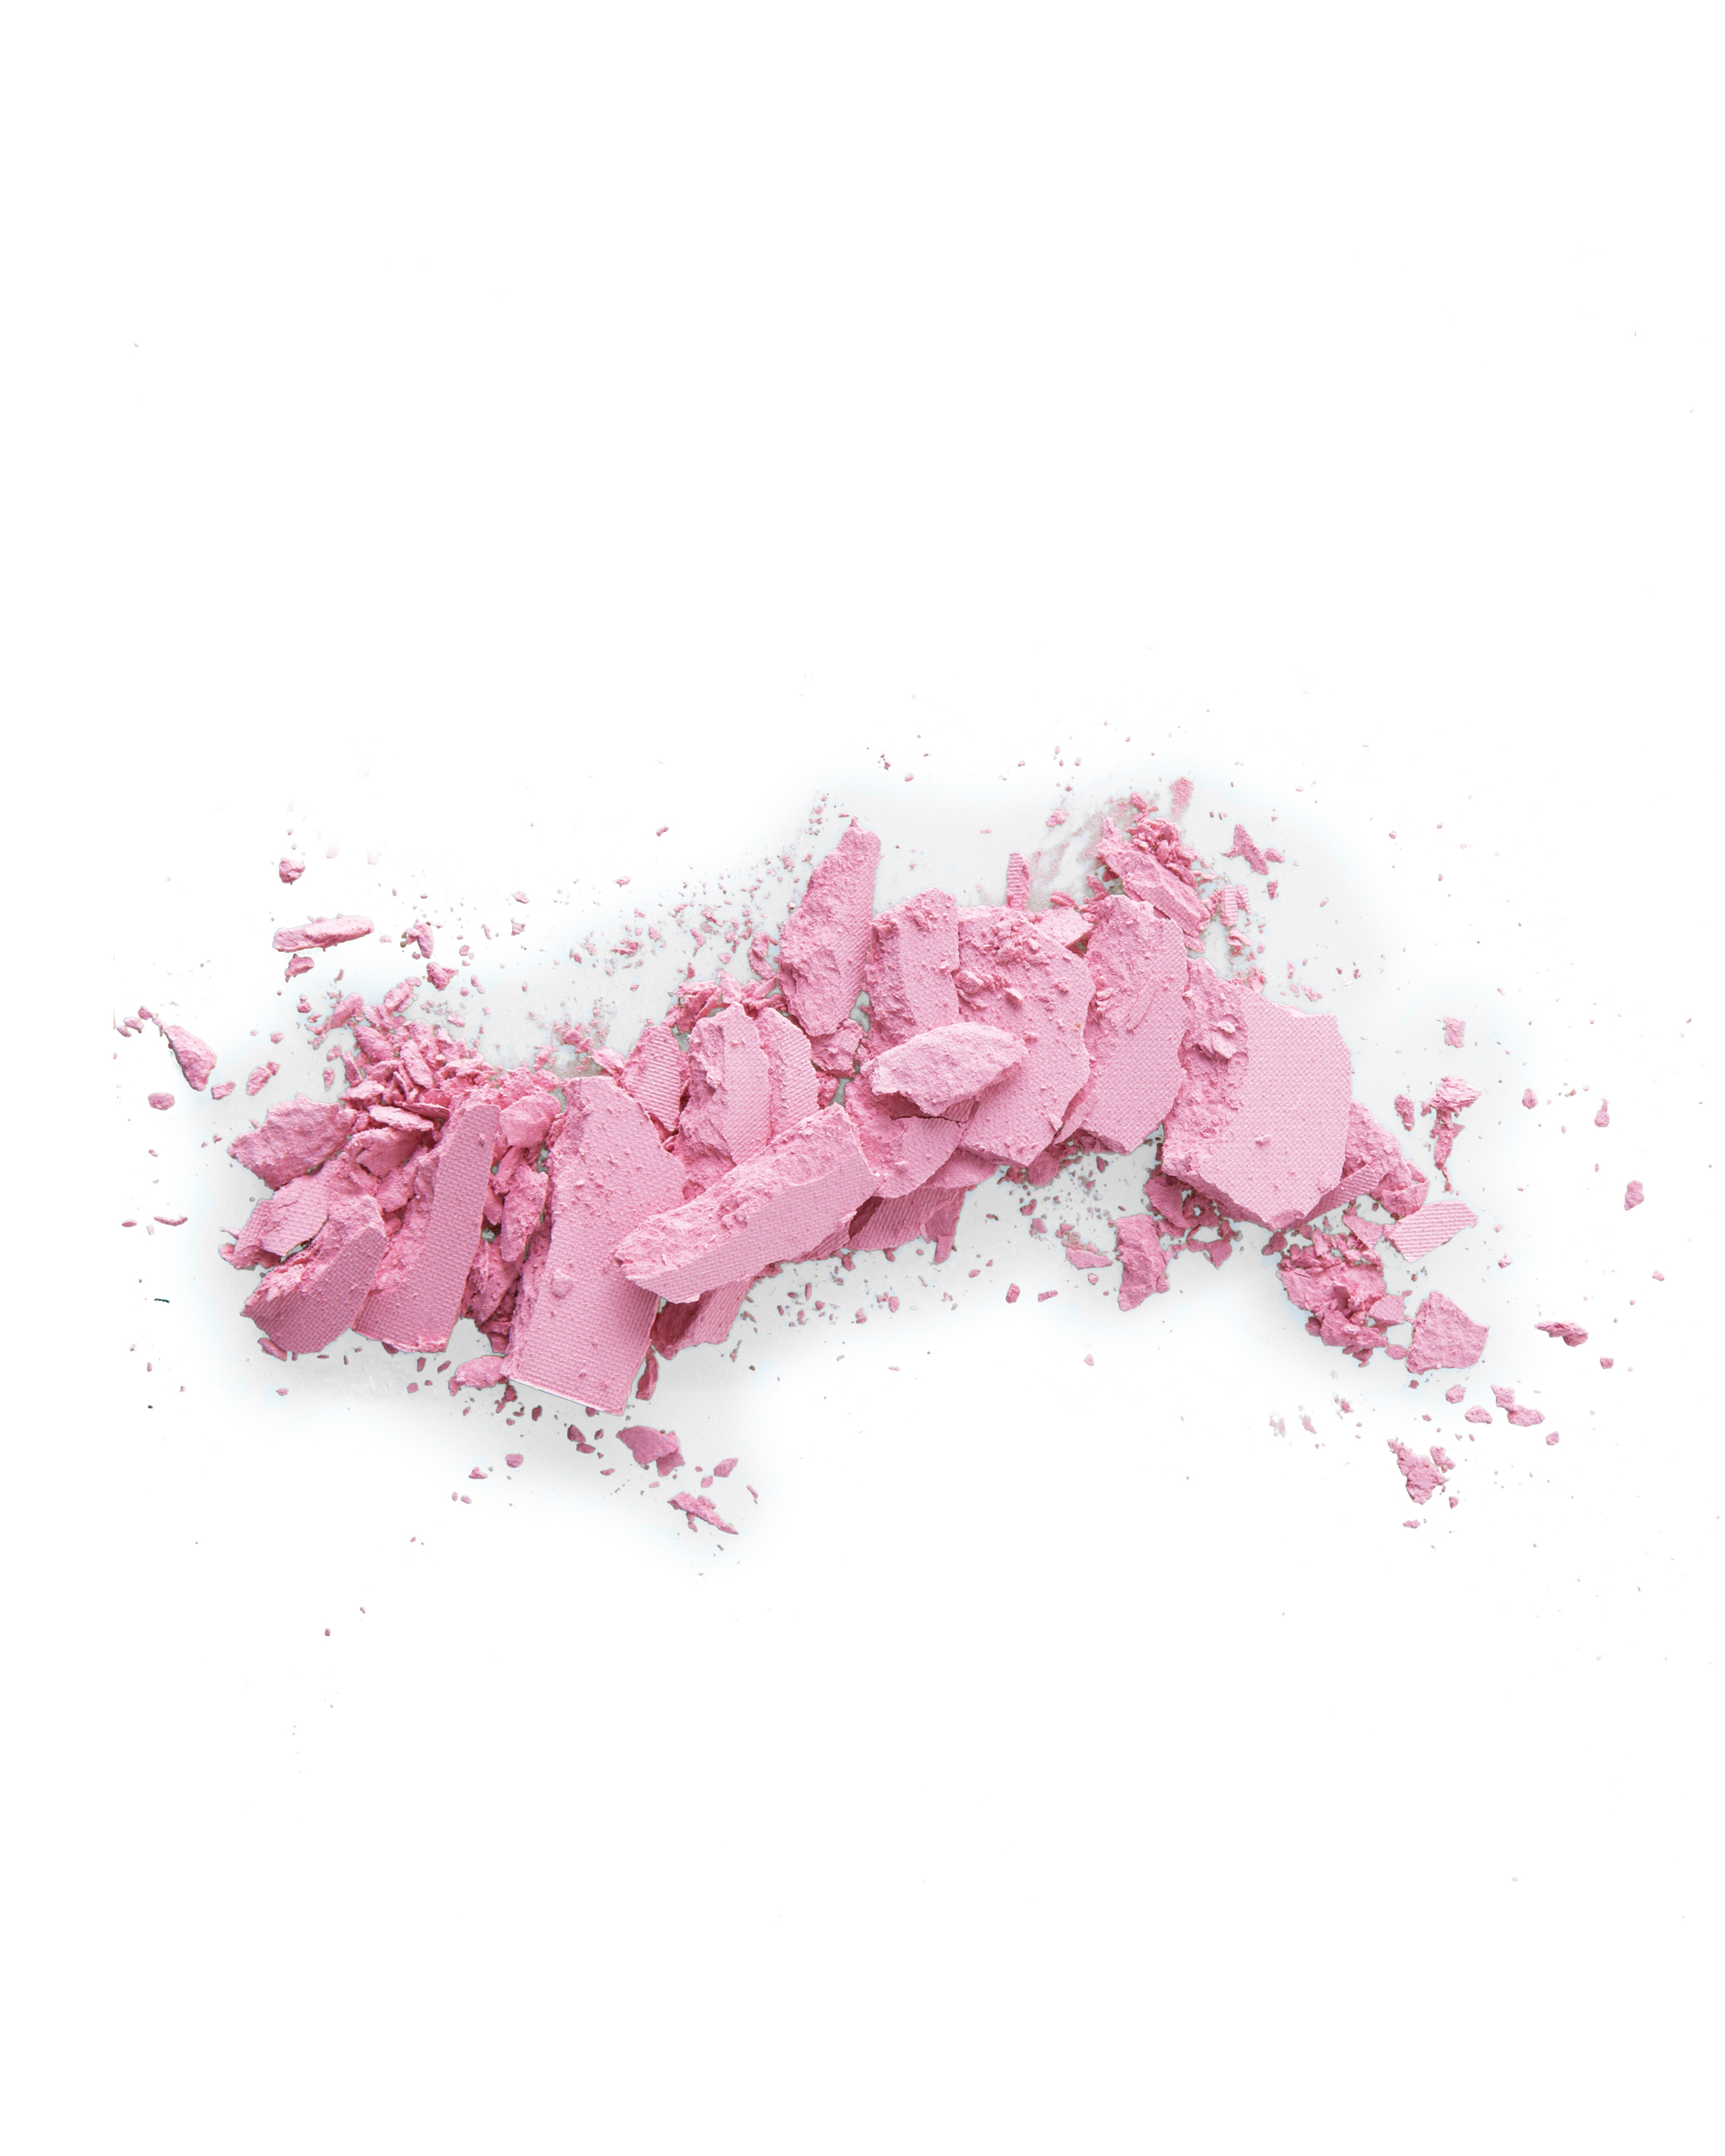 beauty-lips-cheeks-powder-blush-mwd108515.jpg